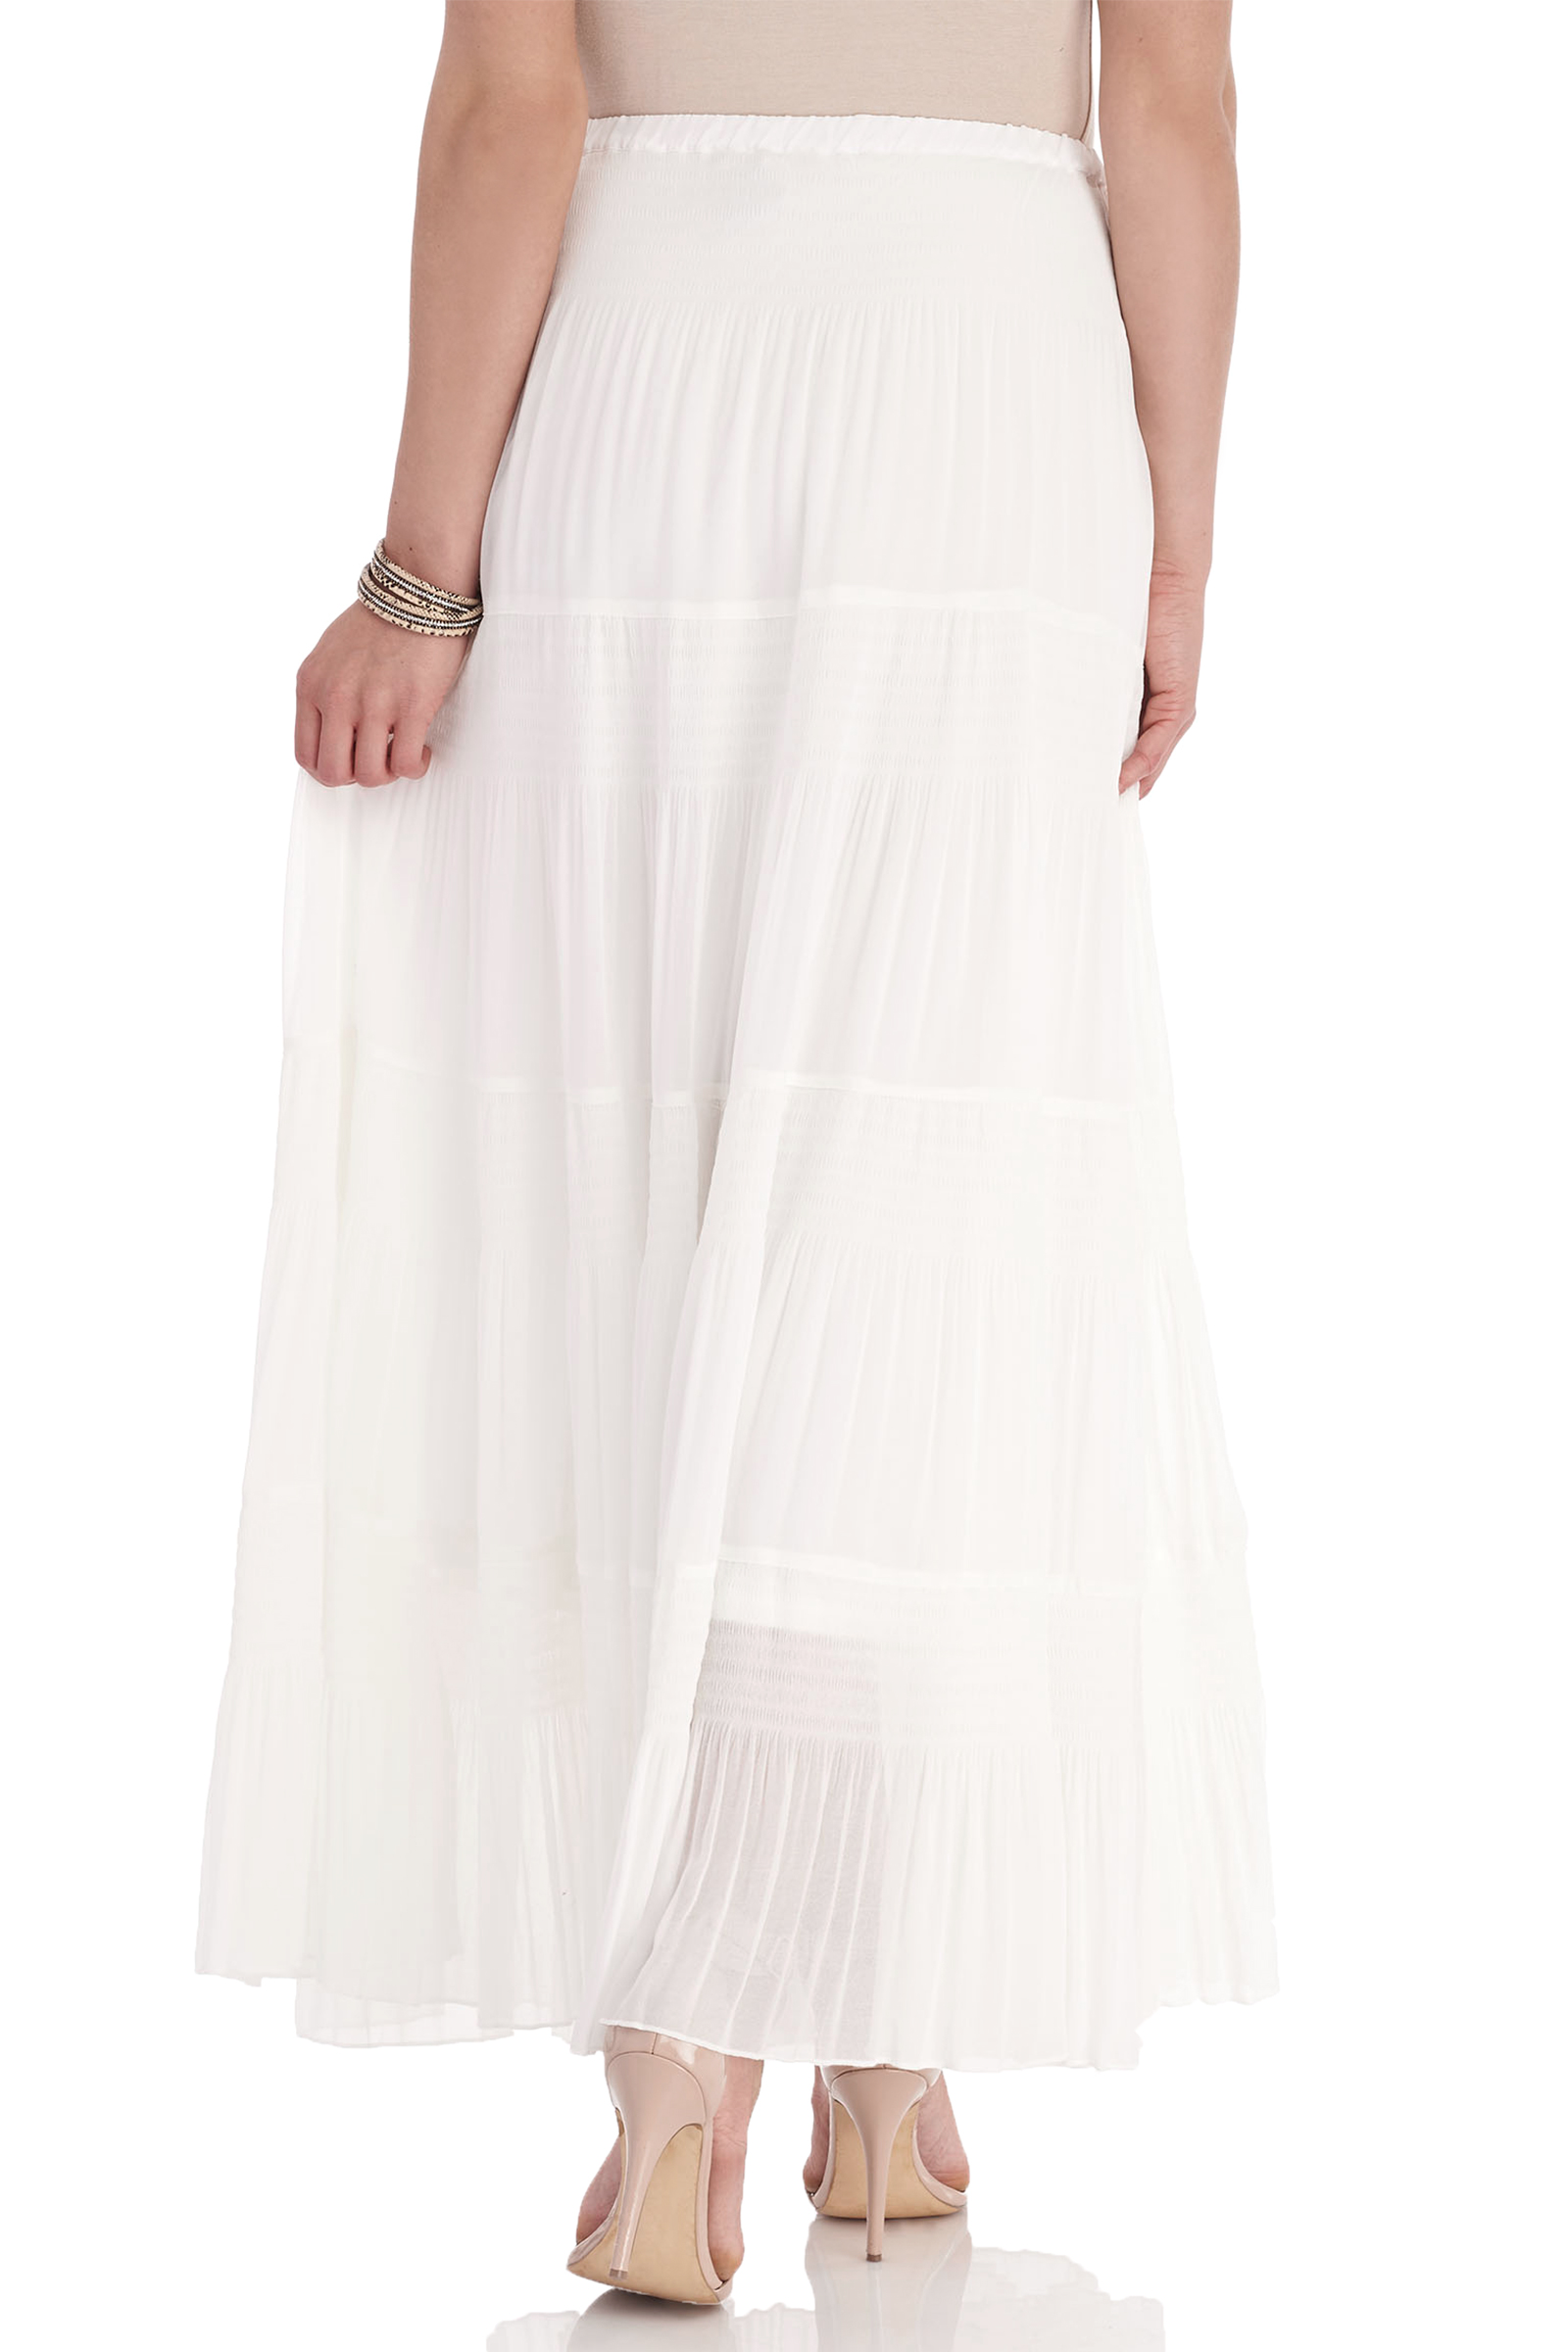 Chiffon Crinkle Detail Maxi Skirt | FREE Shipping* | Melanie Lyne